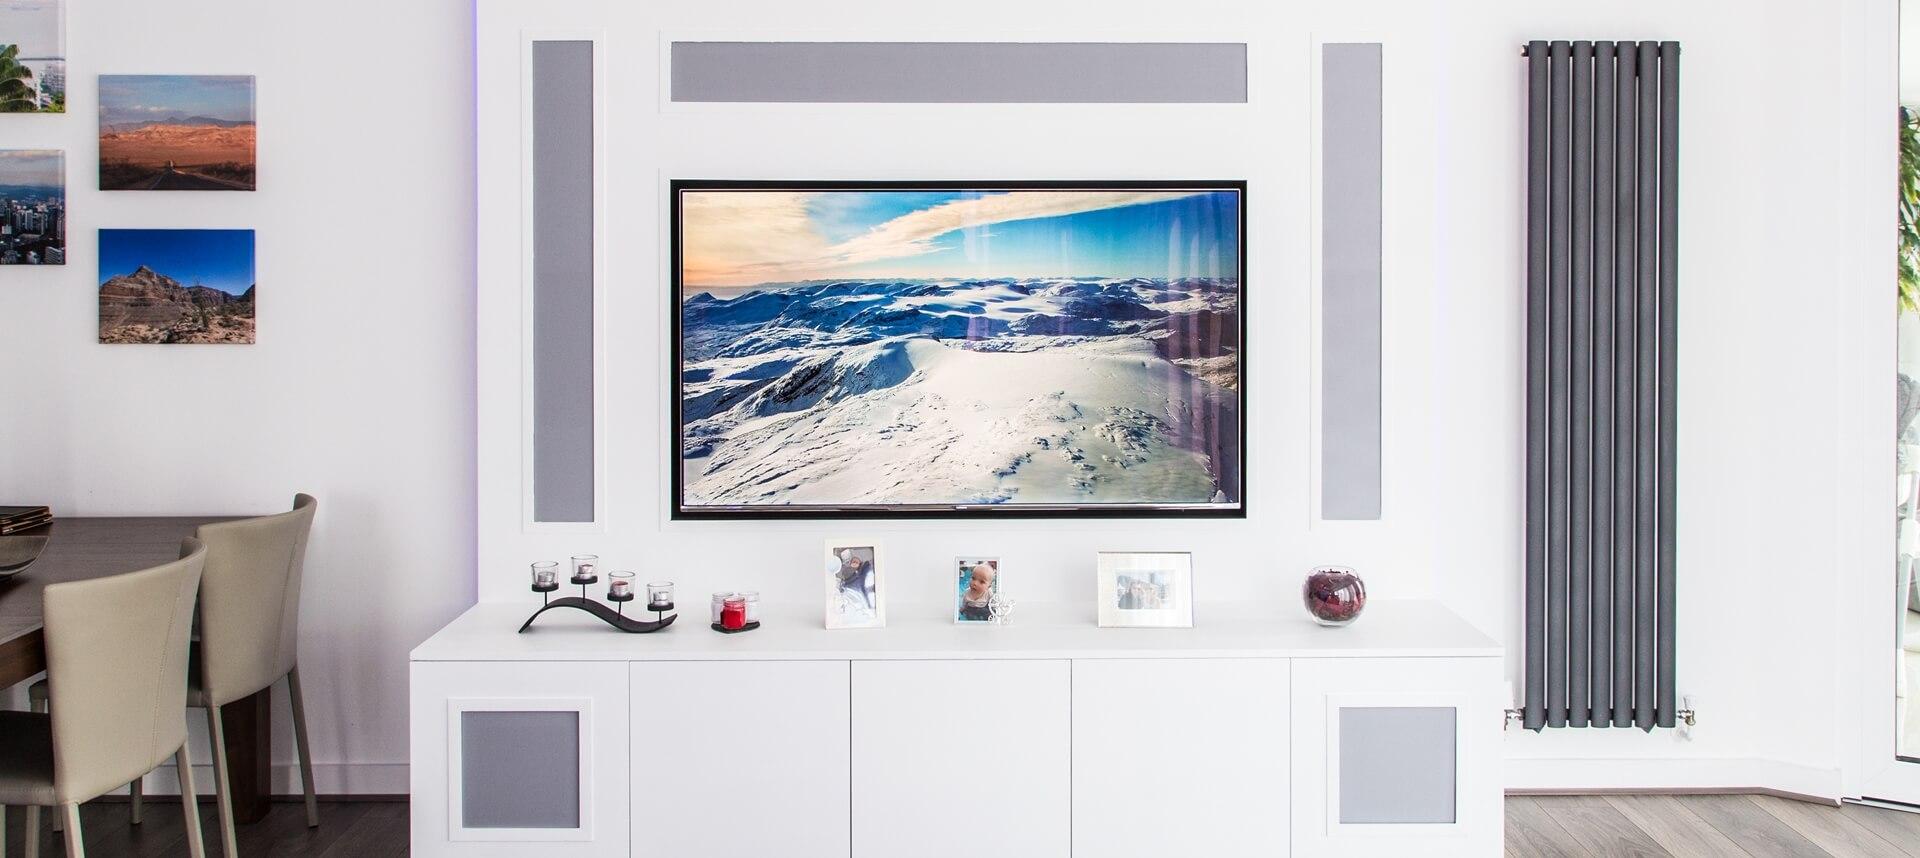 Loxone Case Study   Smart Apartment London